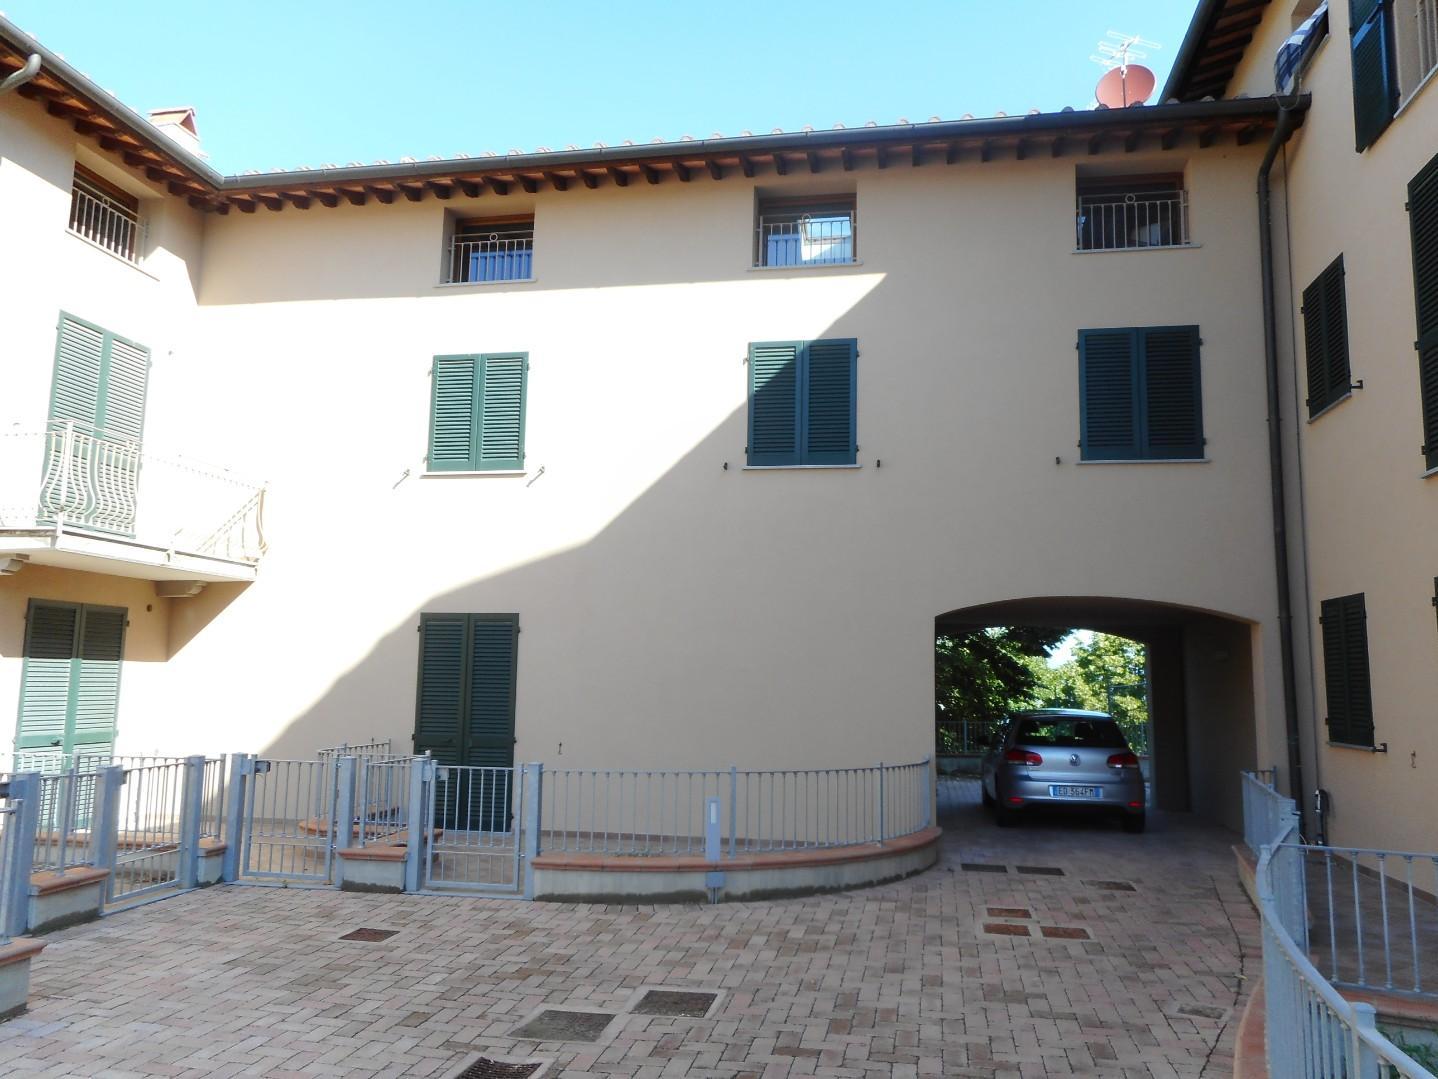 Duplex in vendita a Montopoli in Val d'Arno (PI)